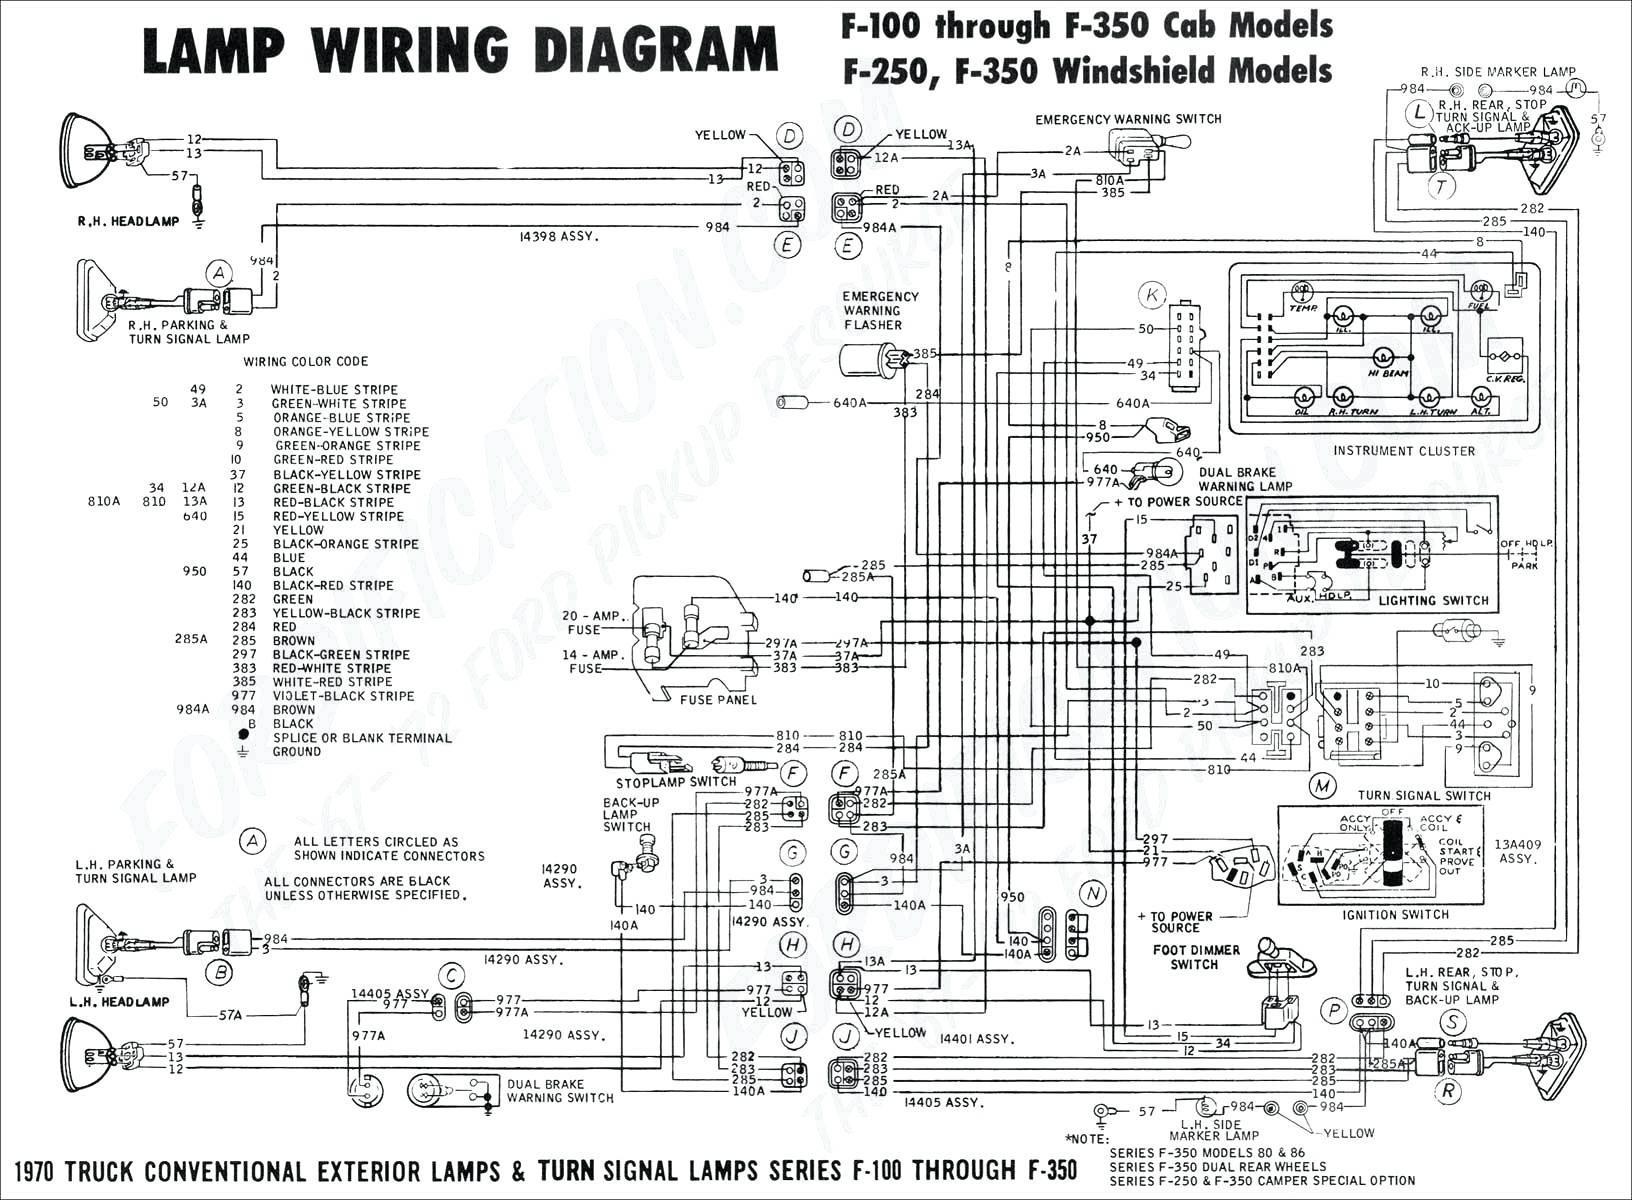 2004 chevy silverado wiring diagram 2005 trailblazer